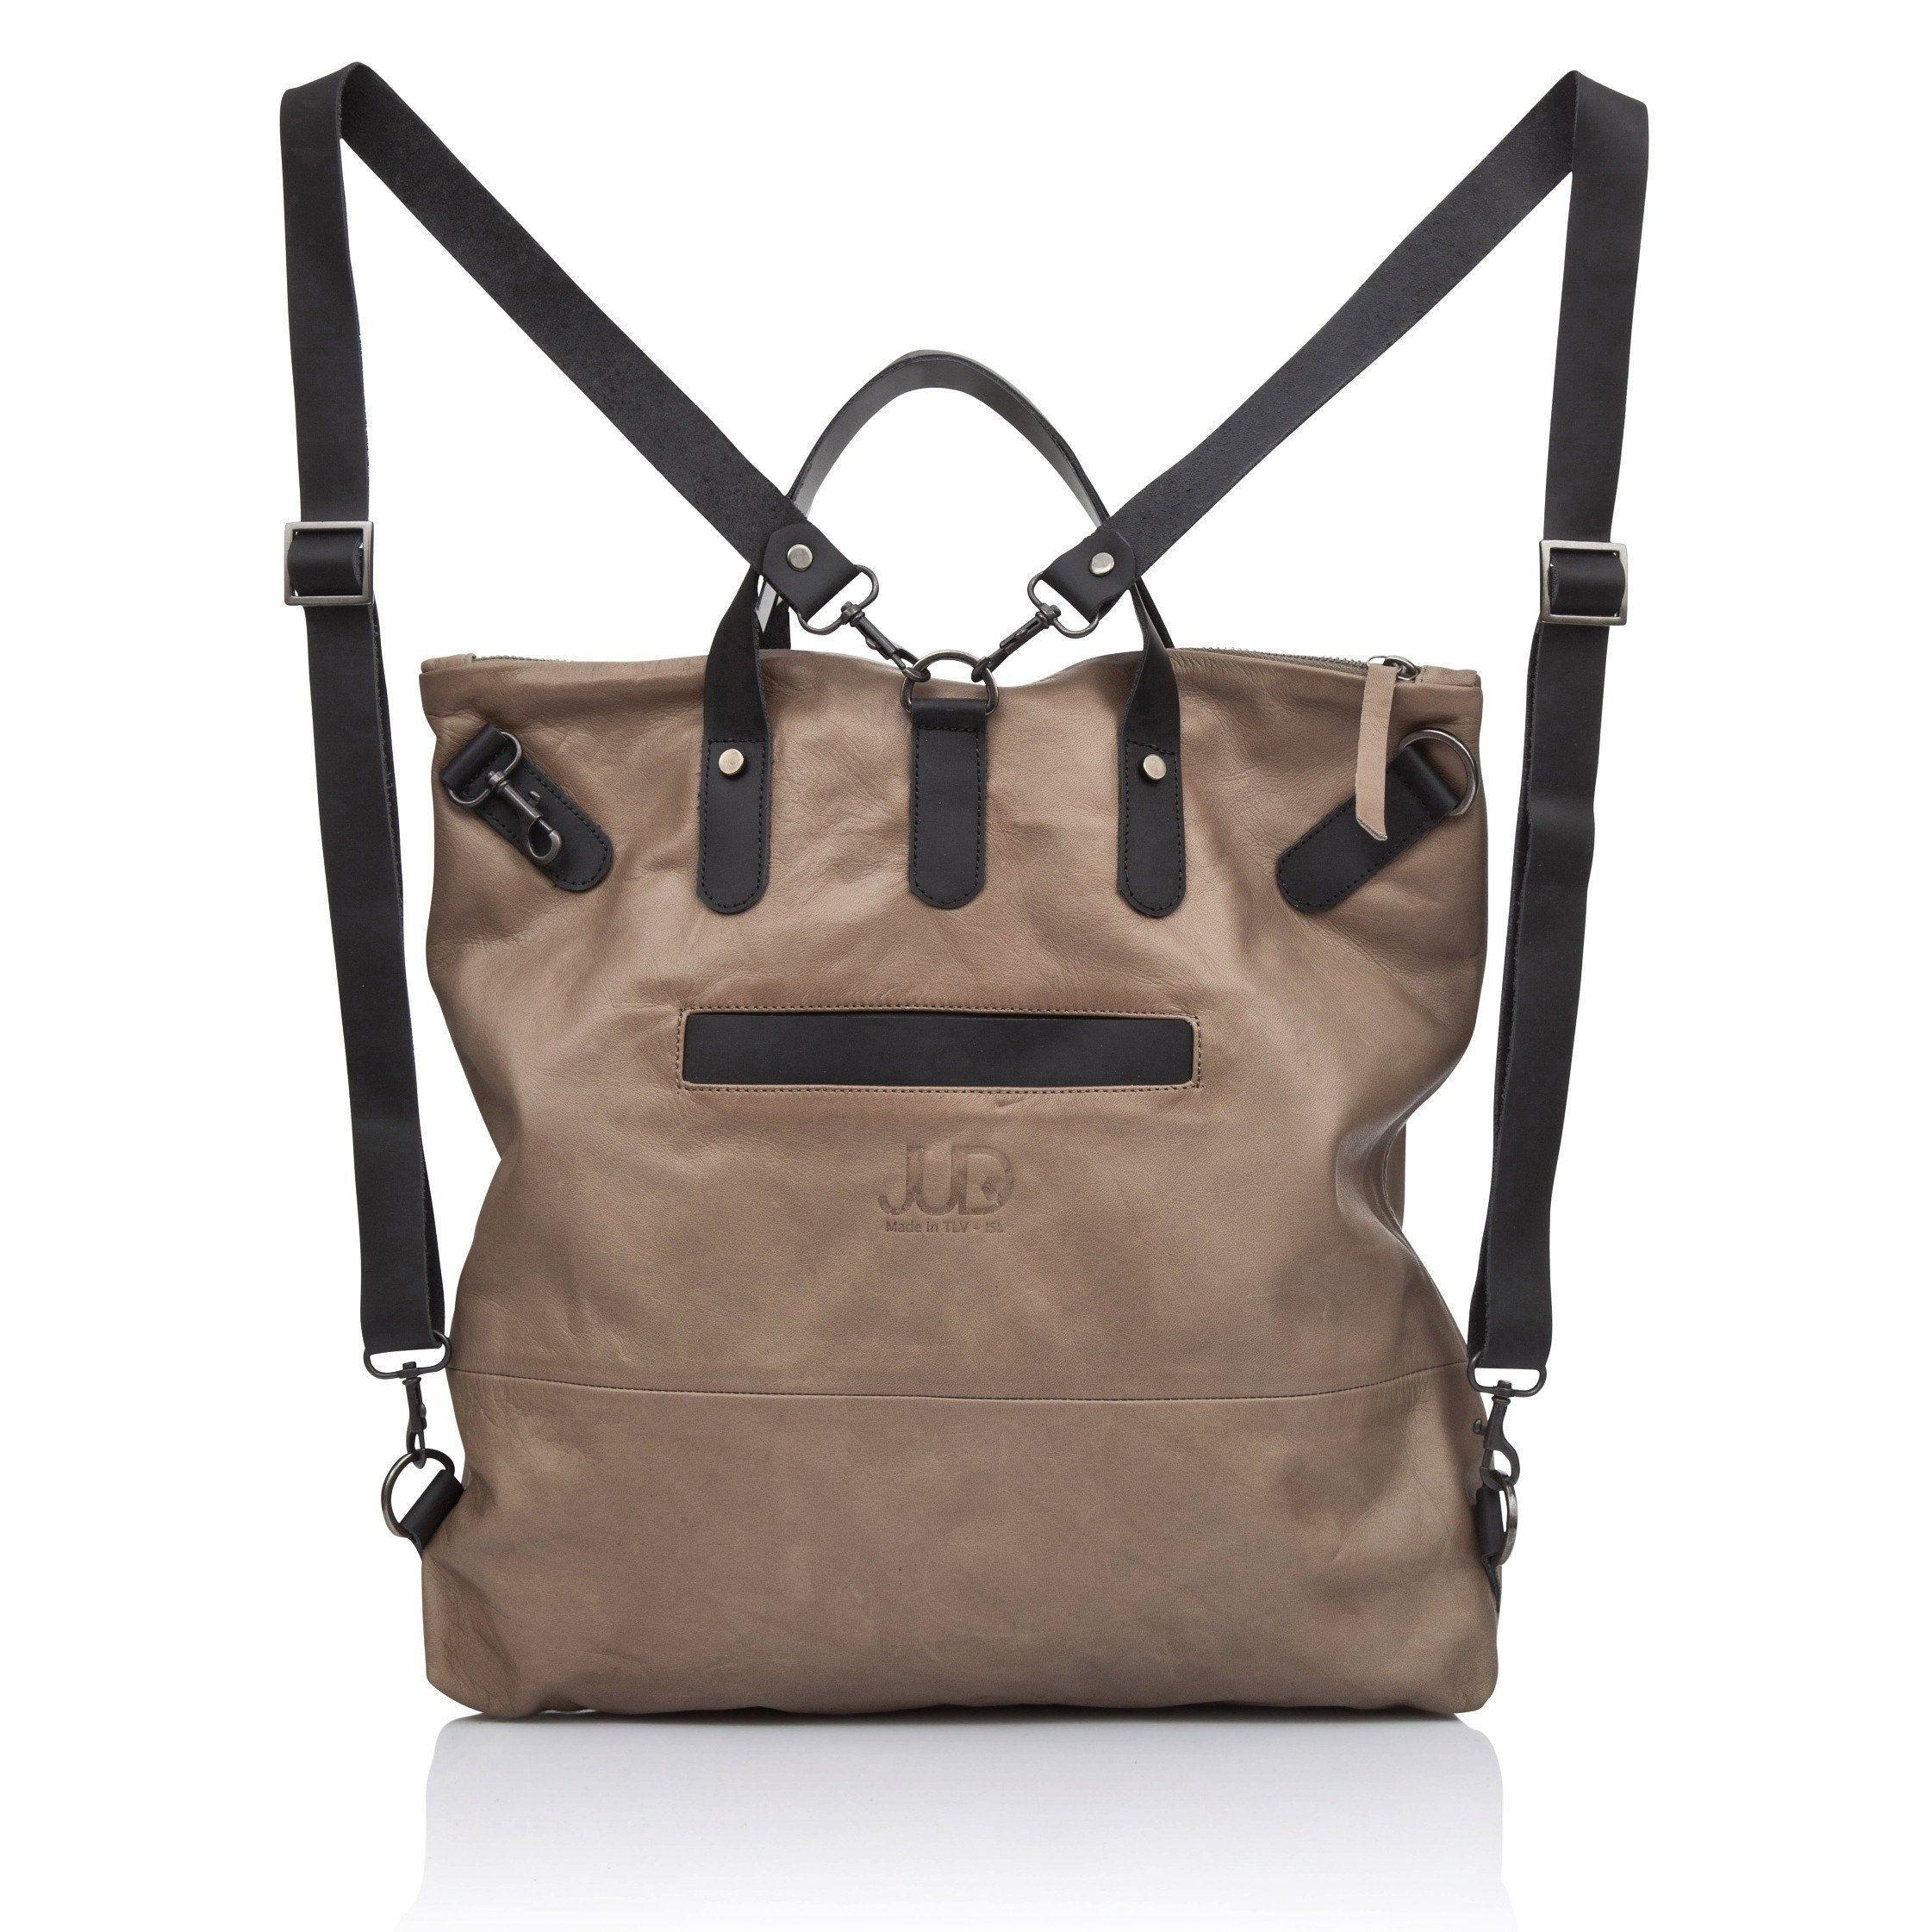 5 Ways With Ziptop Bags 5 Ways With Ziptop Bags new pics